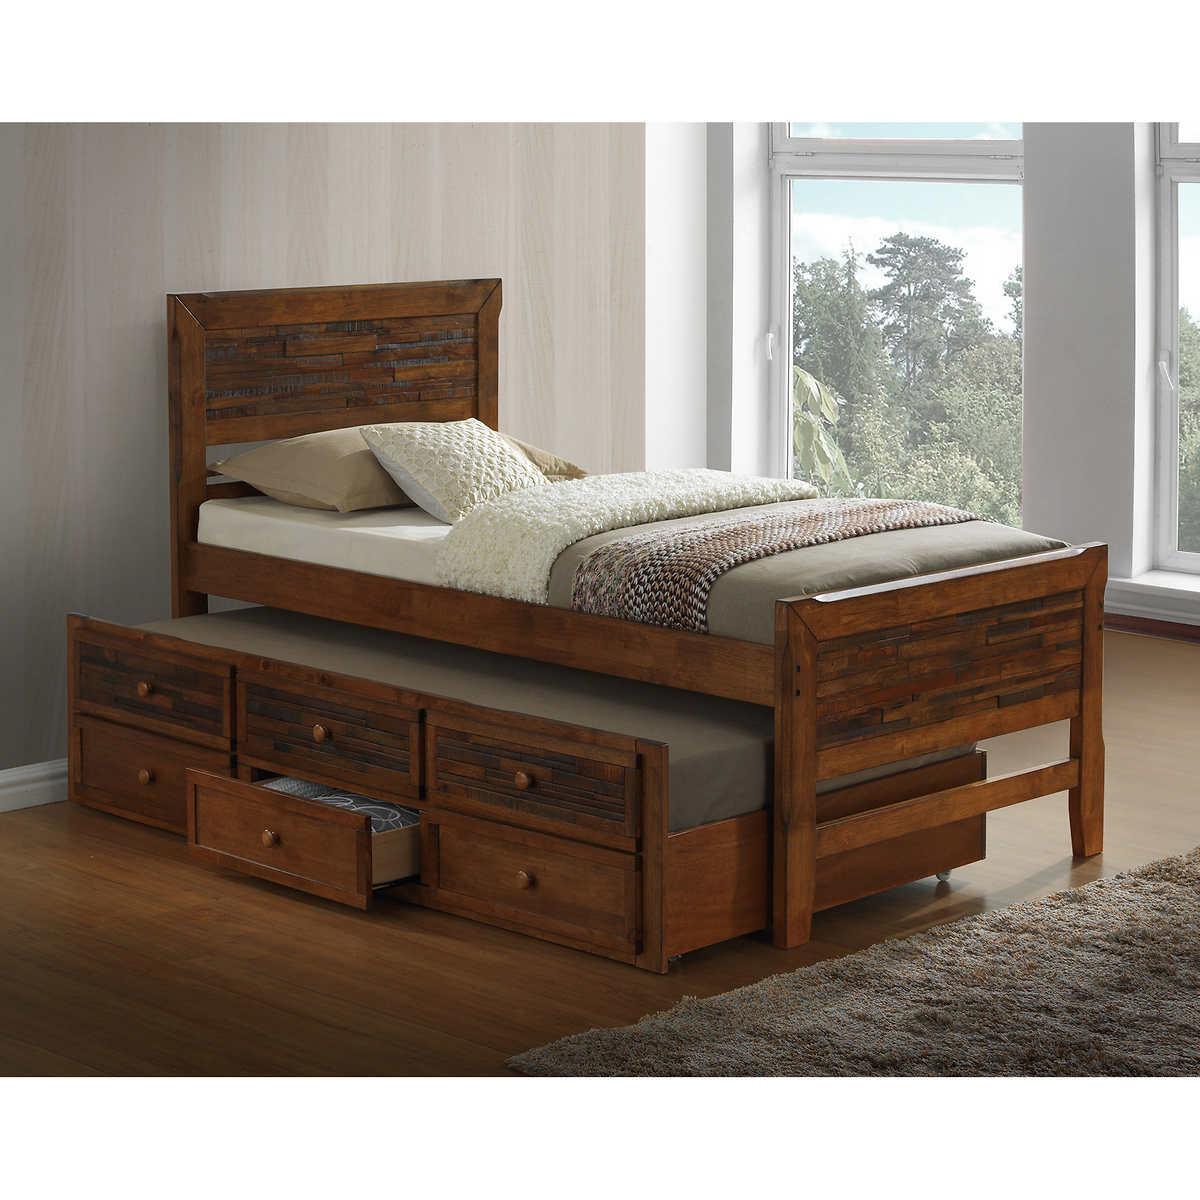 Sears Bedroom Furniture Sears Canada Children S Bedroom Furniture Best Bedroom Ideas 2017